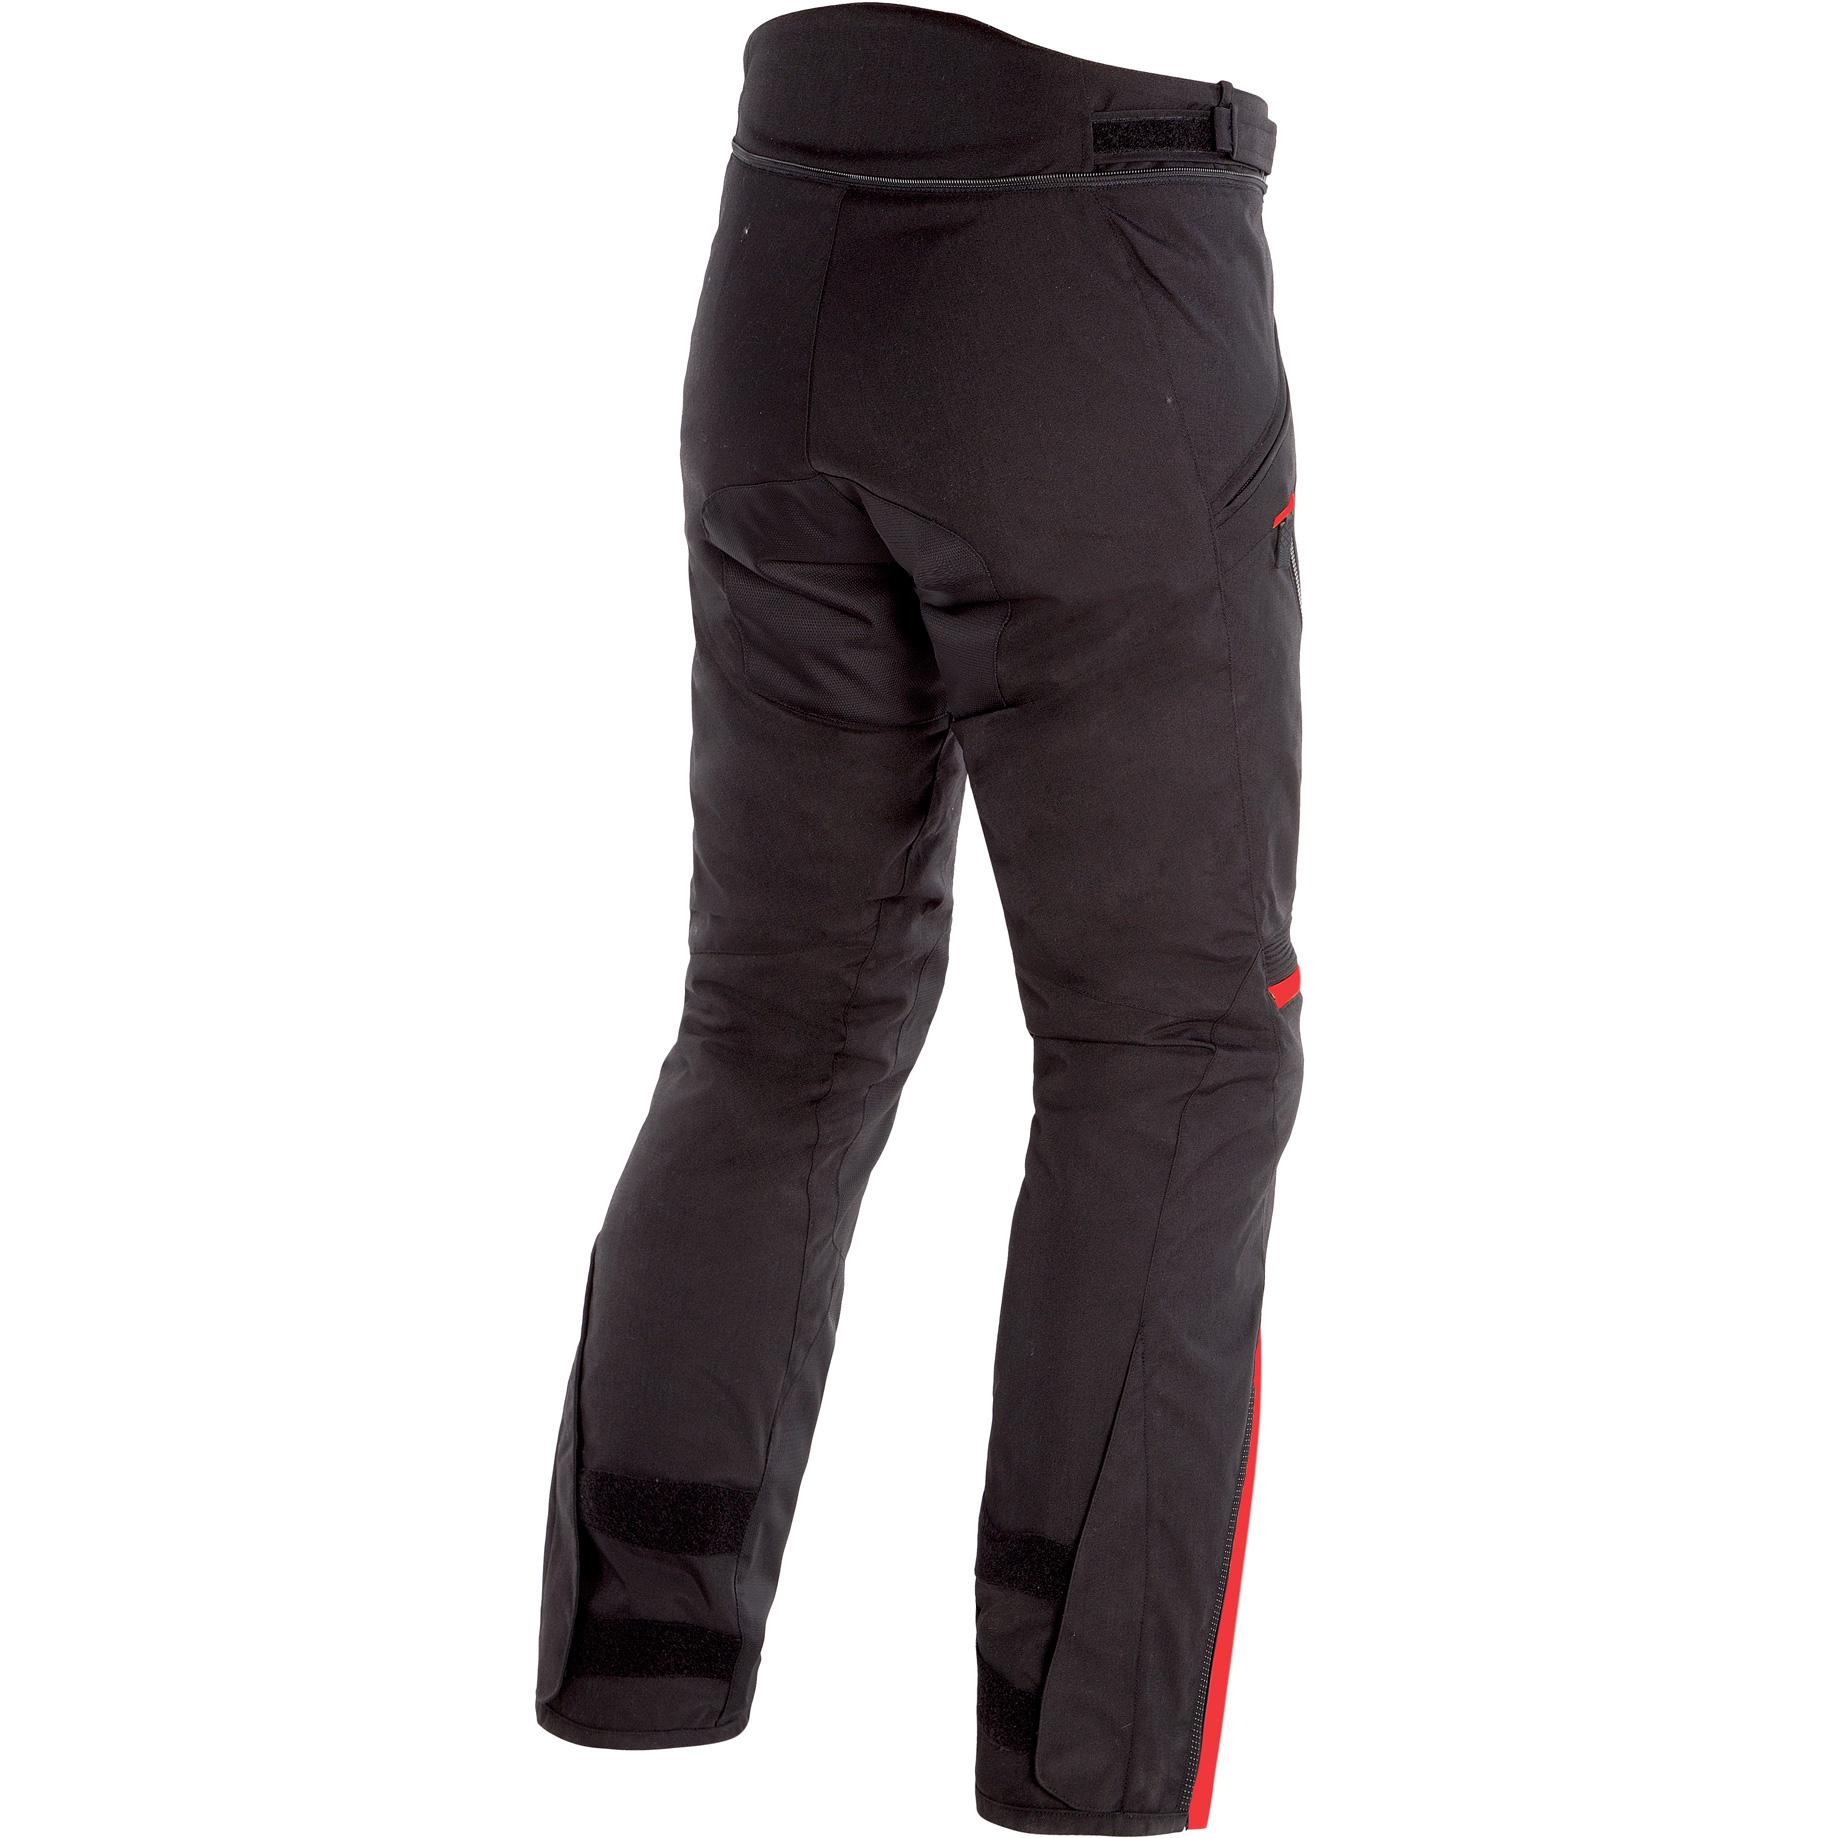 DAINESE-pantalon-tempest-2-d-dry-image-10939238